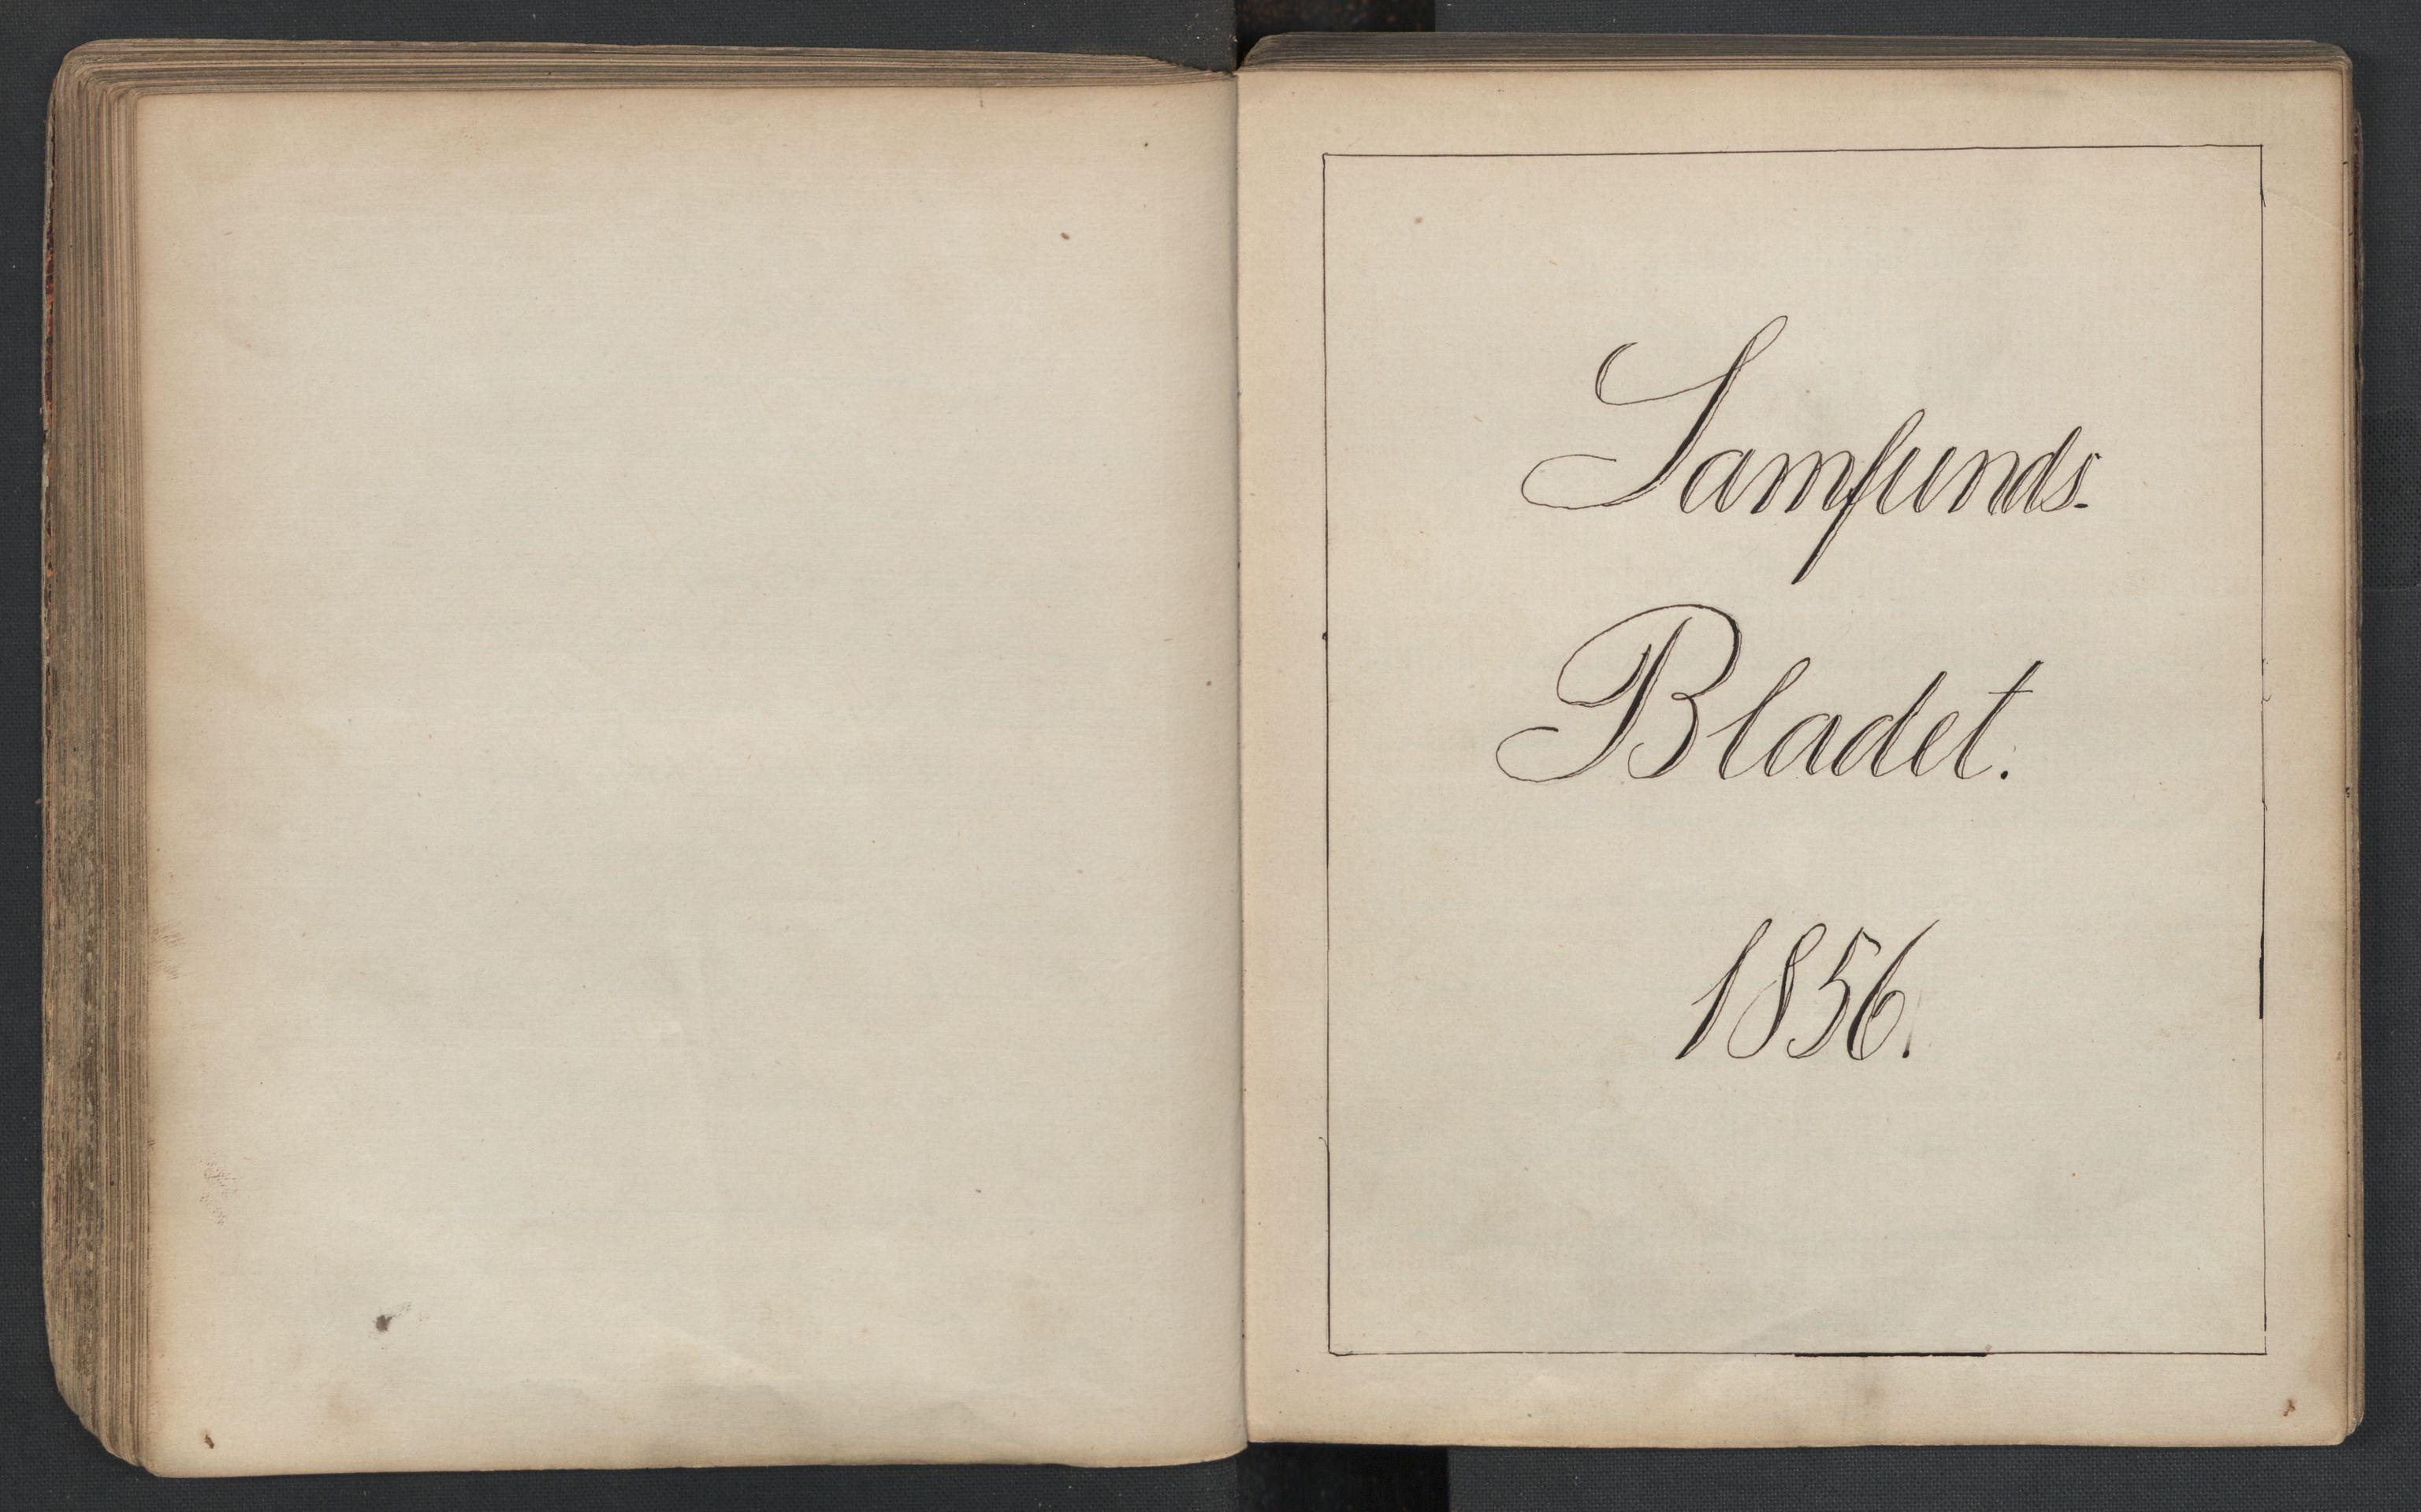 RA, Det Norske Studentersamfund, X/Xa/L0005, 1855-1856, s. 92